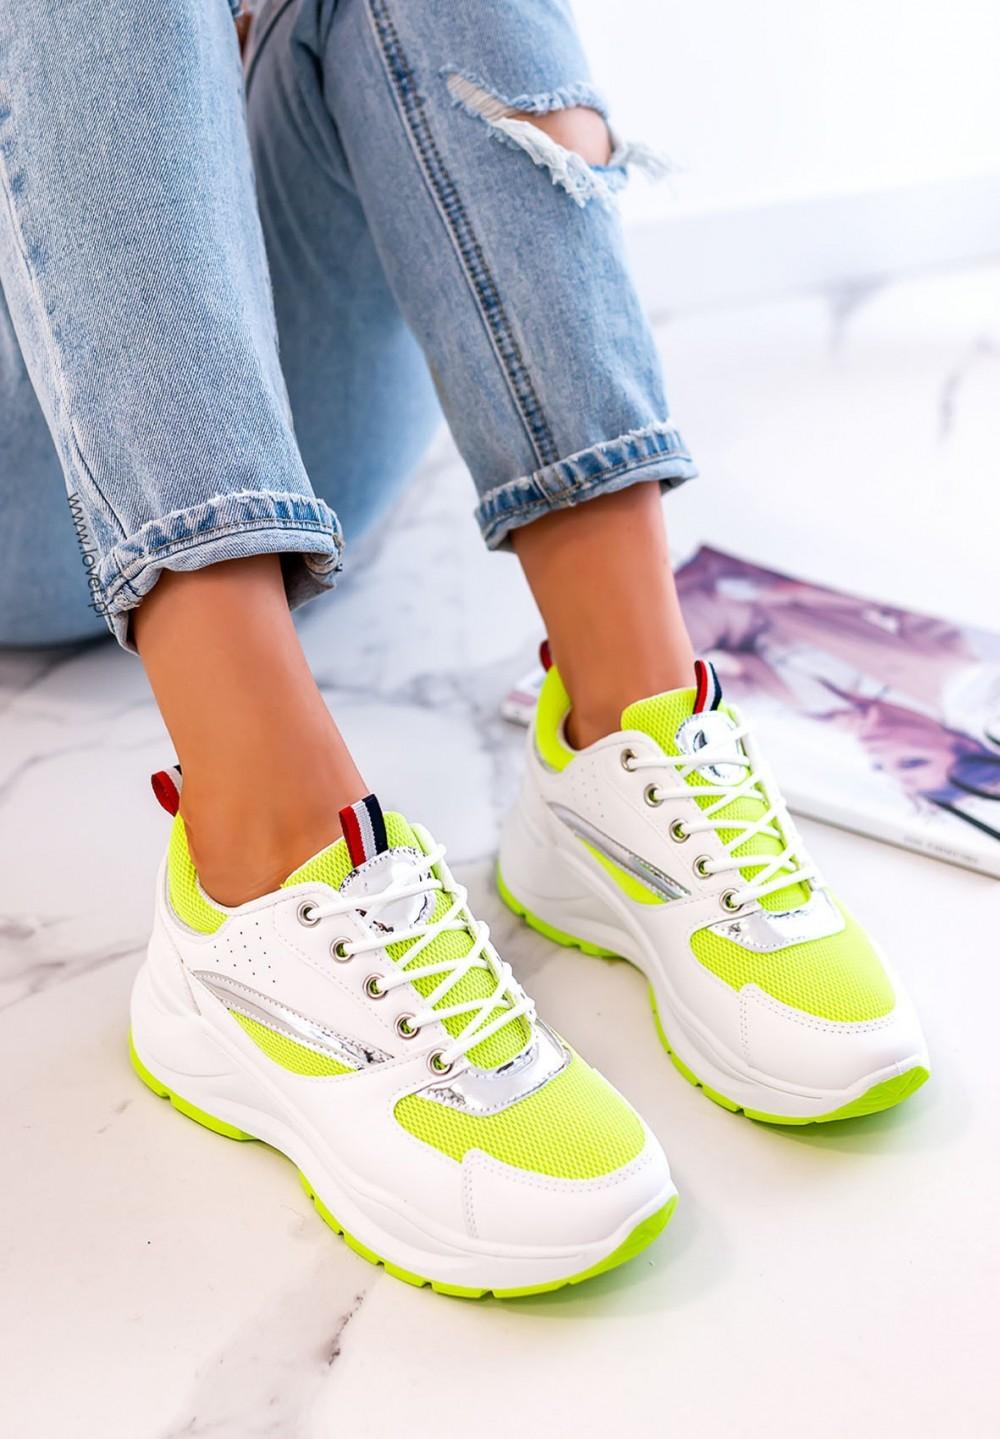 Sneakersy Sznurowane Zielone Neon Rita